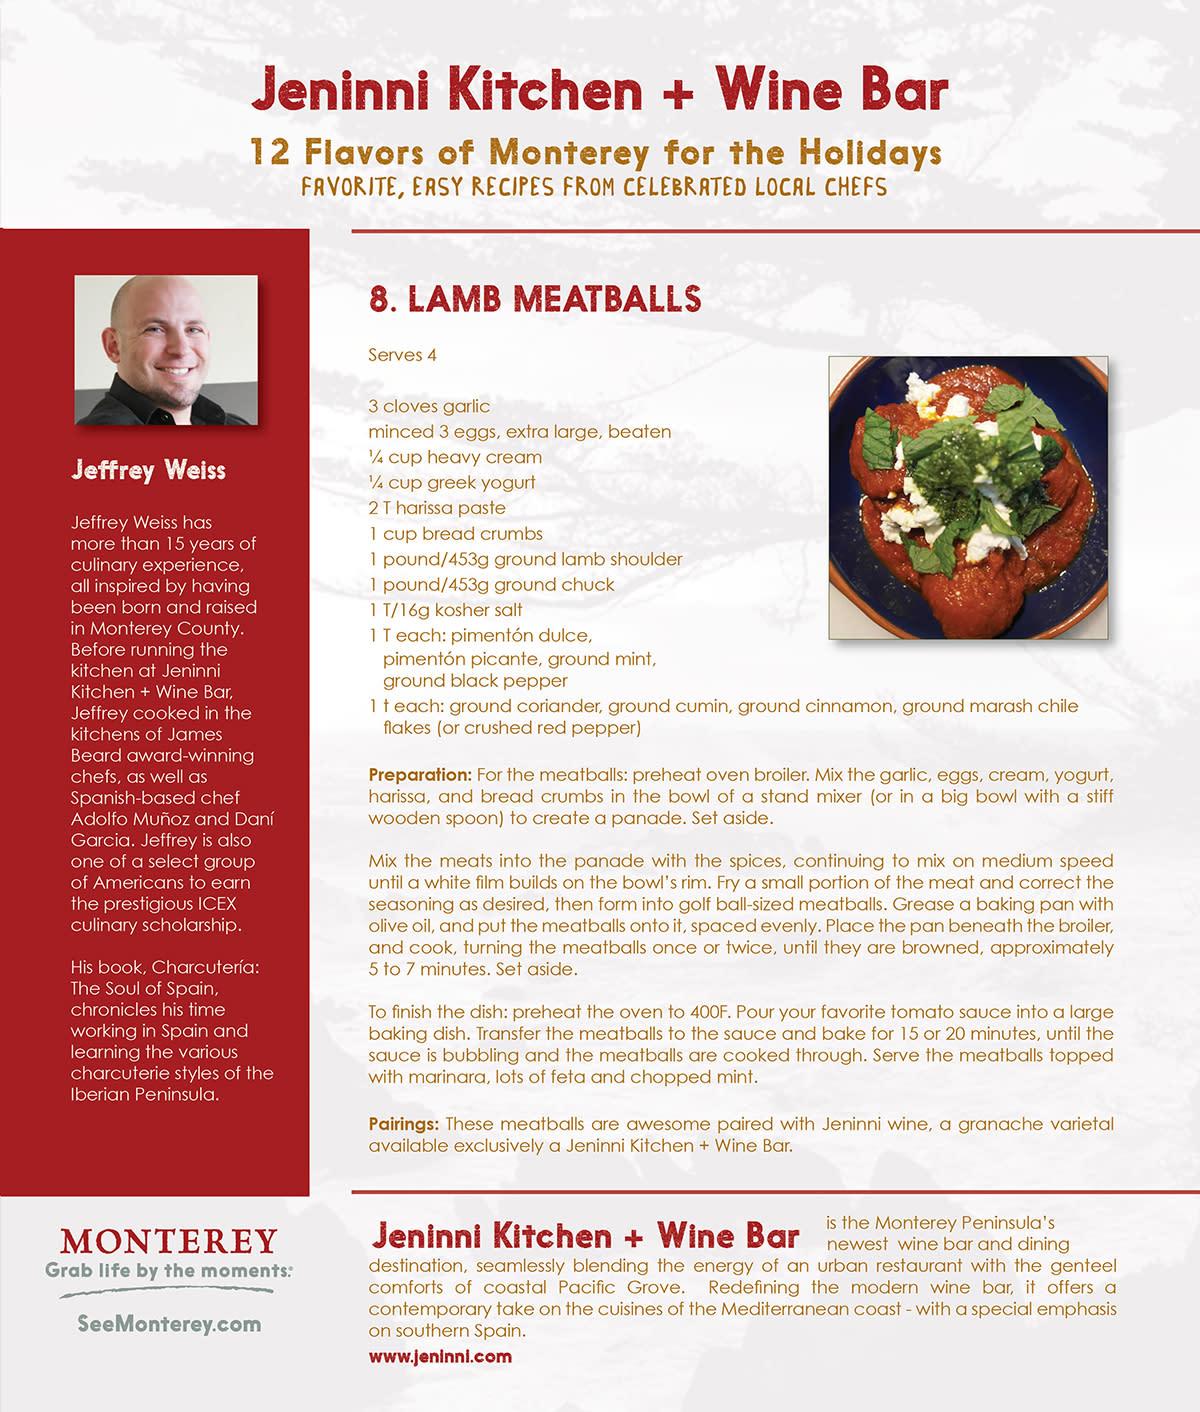 12 Flavors of Monterey- Day 8: jeninni kitchen + wine bar